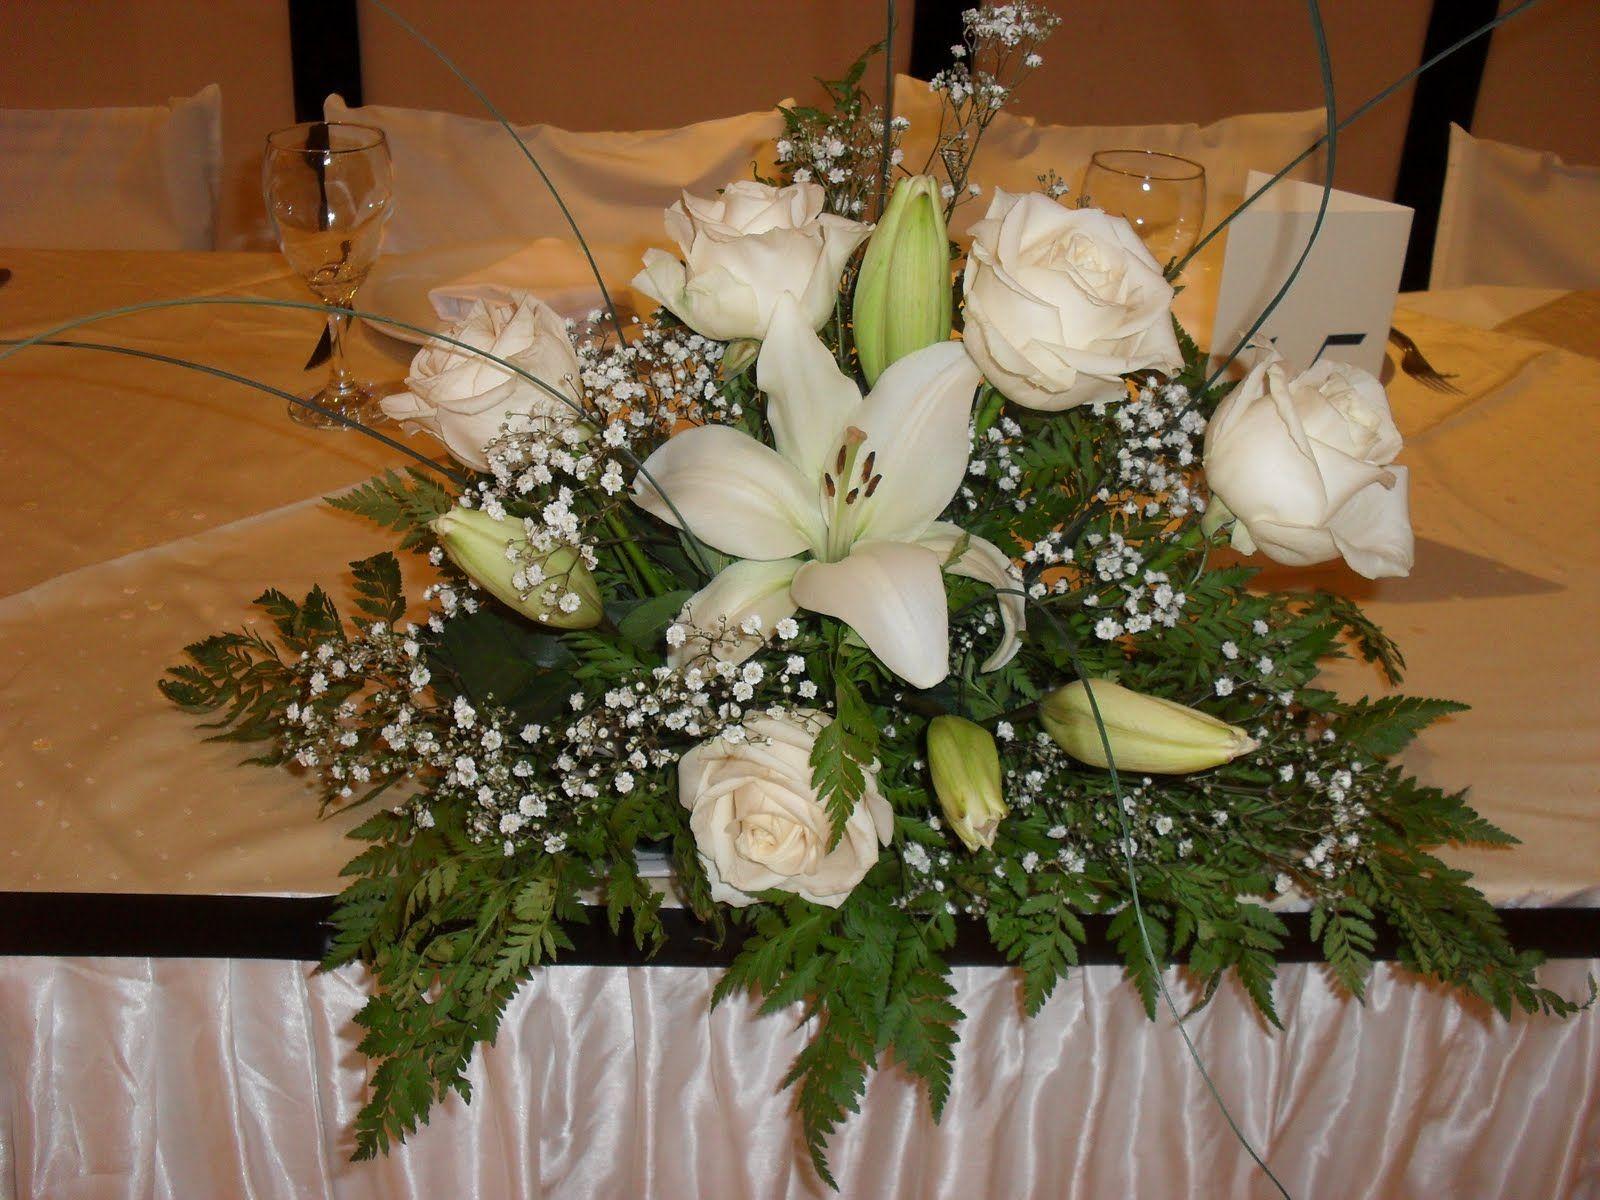 Arreglos florales para centros de mesa de bodas www - Centros de mesa ...